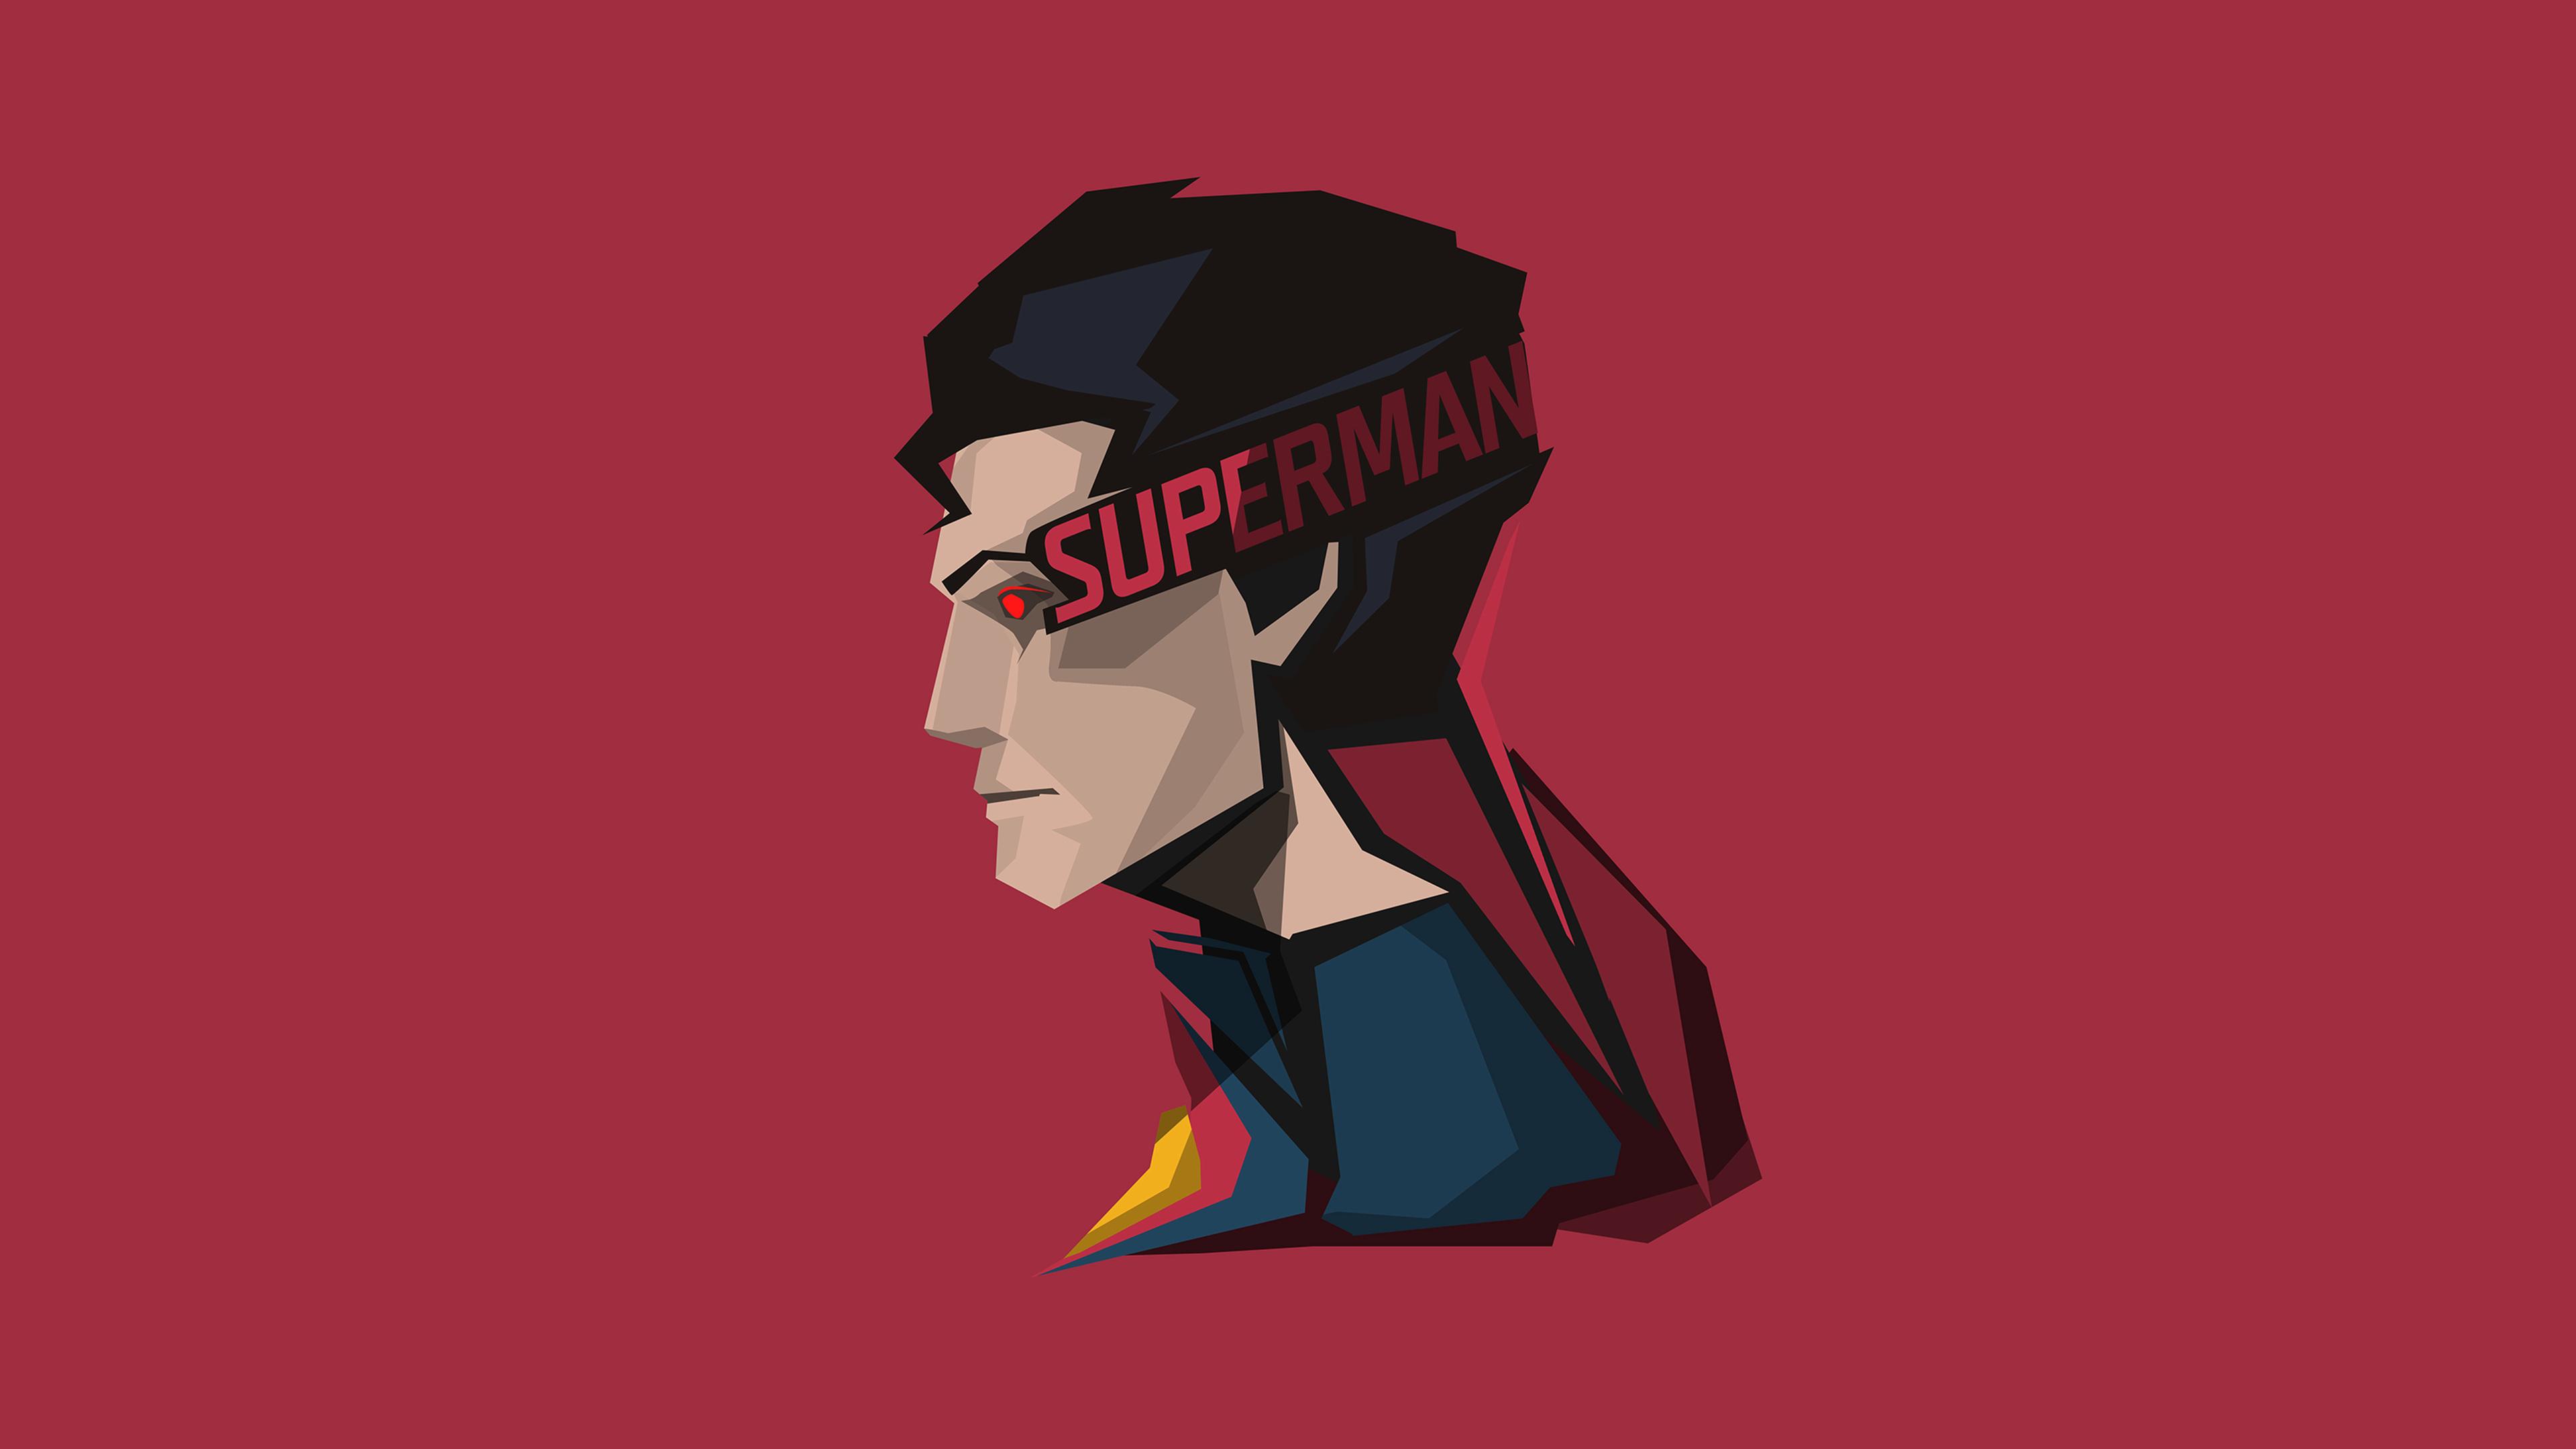 superman minimal 8k 1536523601 - Superman Minimal 8k - superman wallpapers, minimalism wallpapers, hd-wallpapers, digital art wallpapers, artwork wallpapers, artstation wallpapers, artist wallpapers, 8k wallpapers, 5k wallpapers, 4k-wallpapers